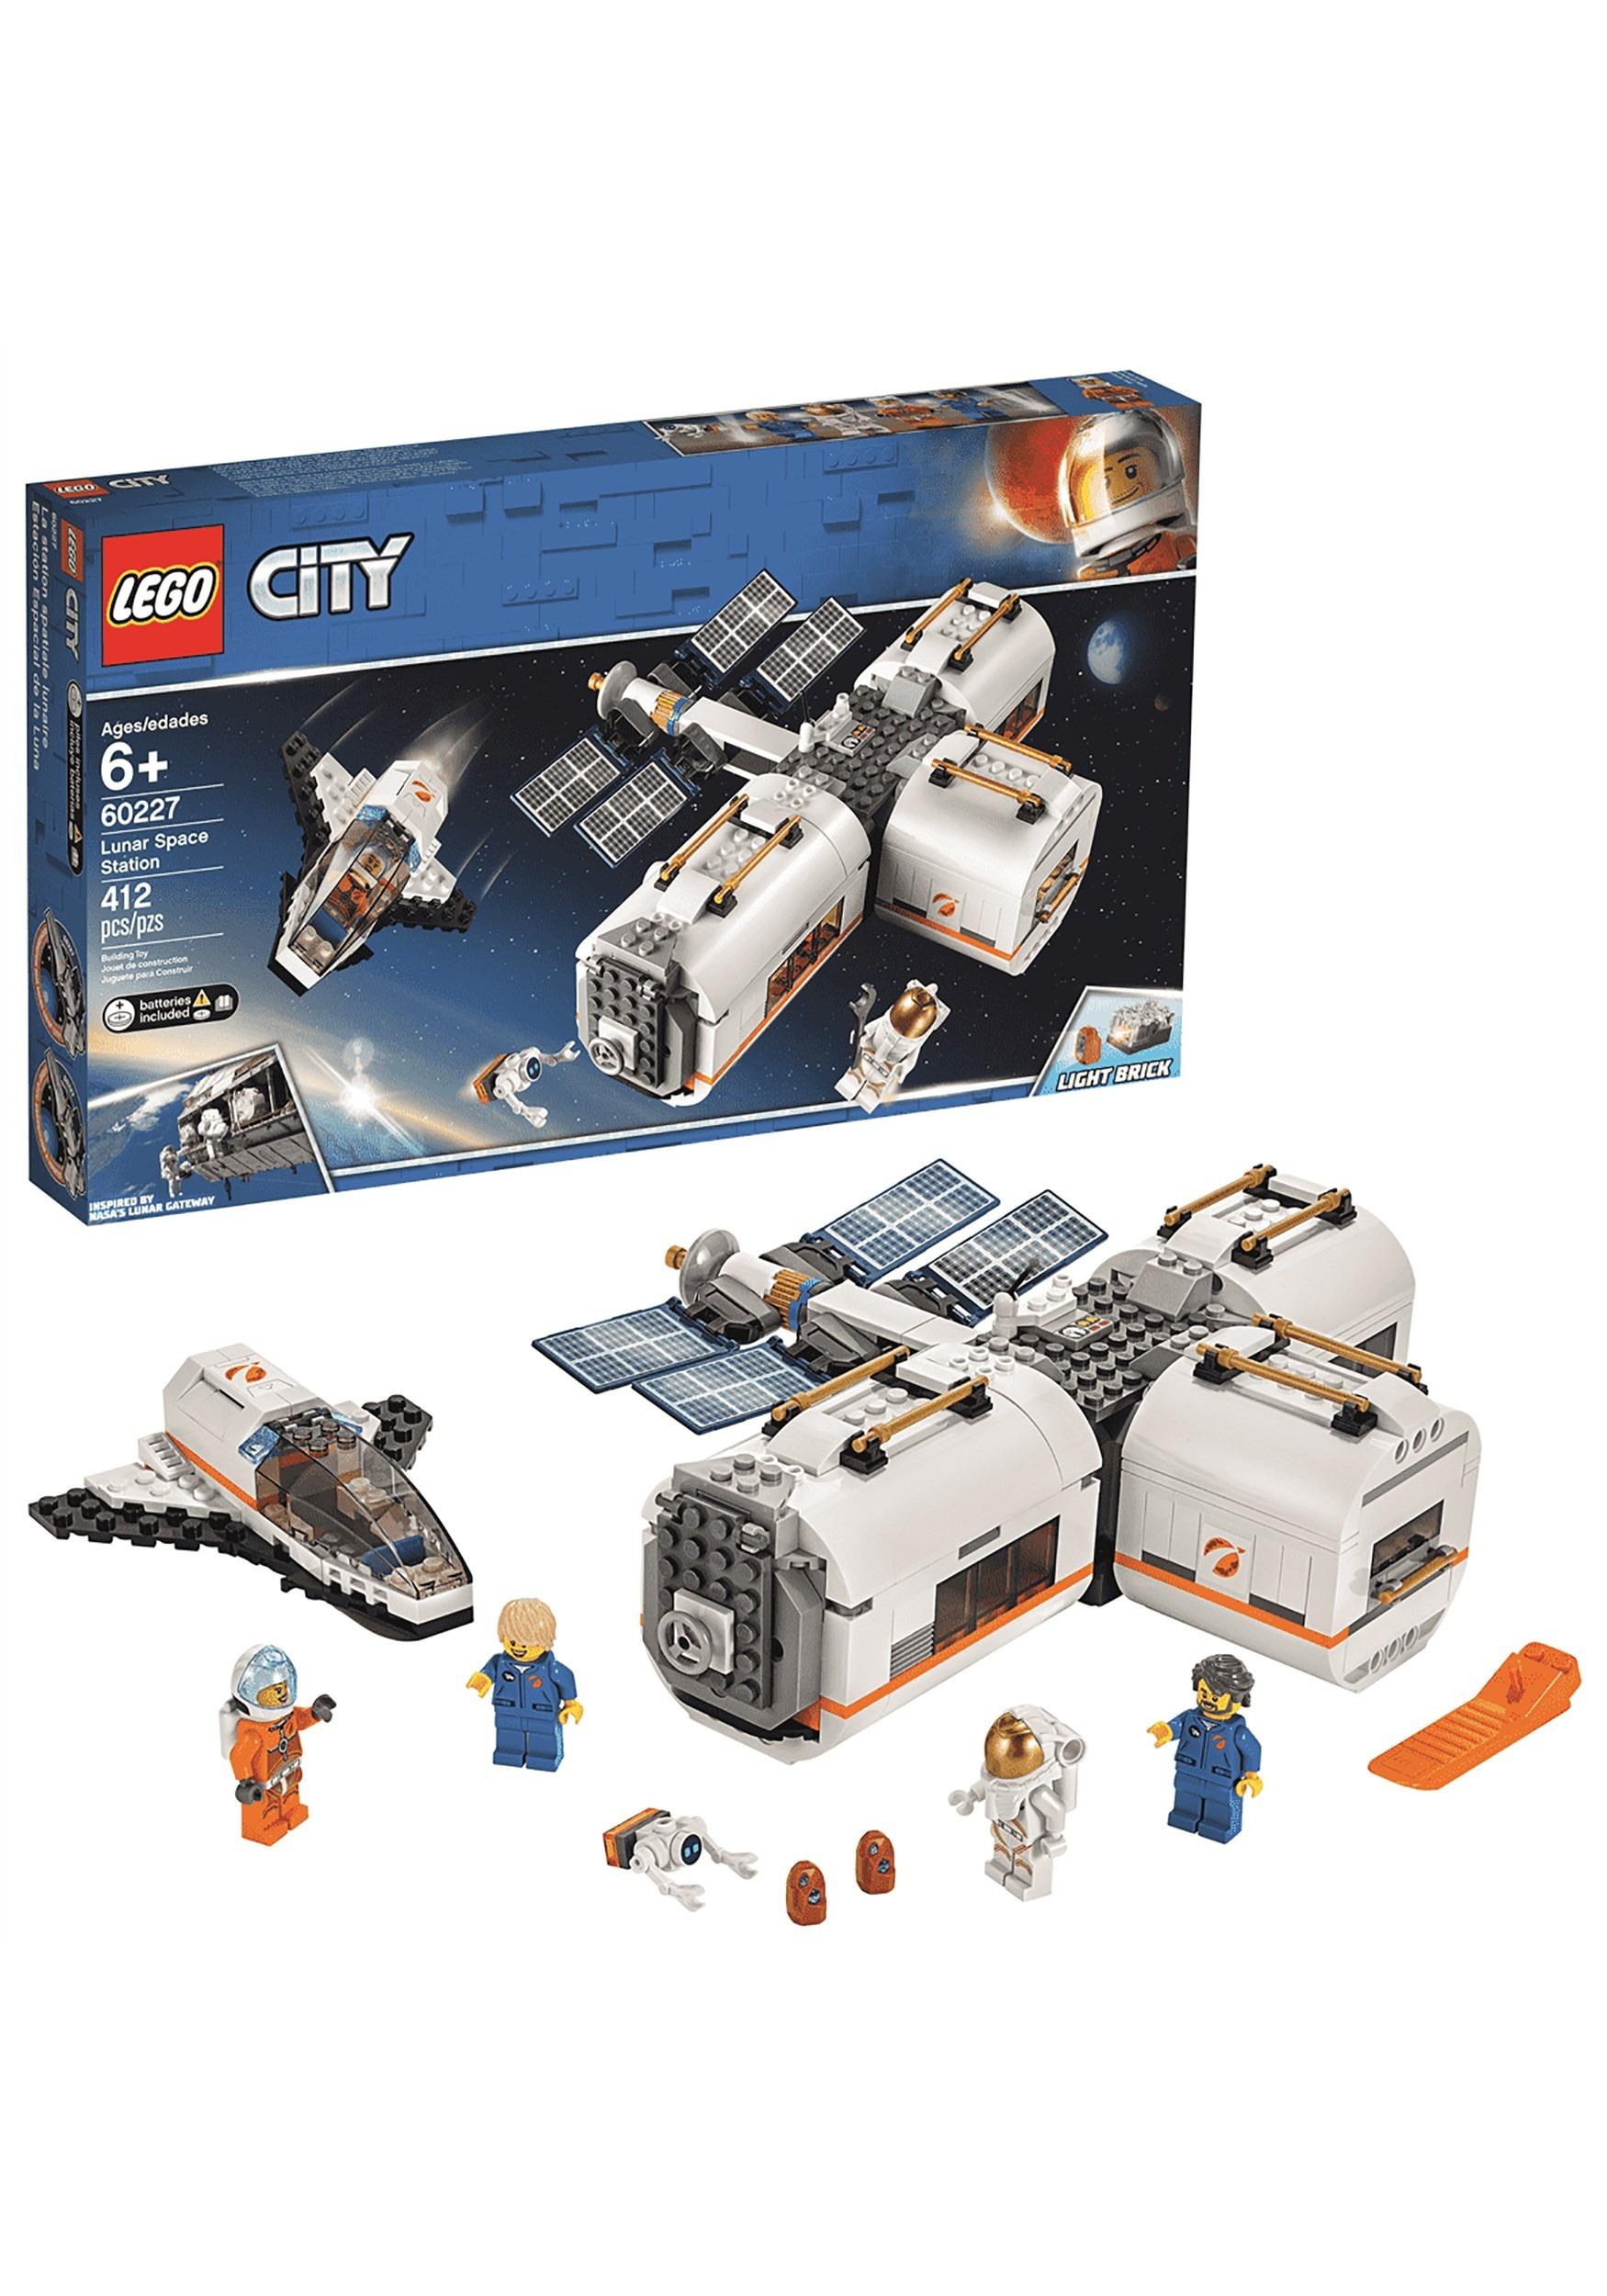 LEGO City Set - Lunar Space Station